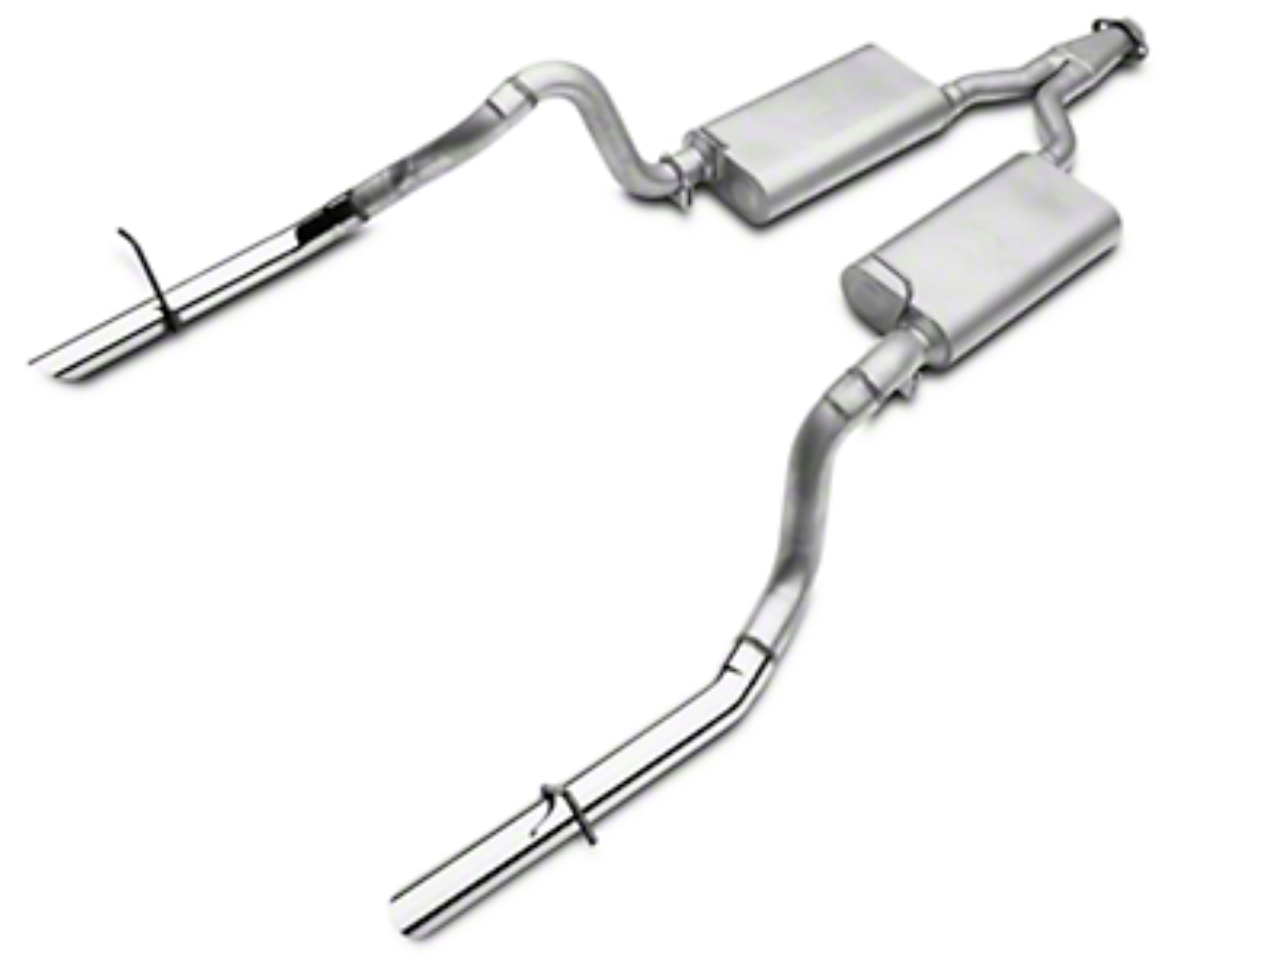 Flowmaster Force II Dual Cat-Back Exhaust (94-97 V6)